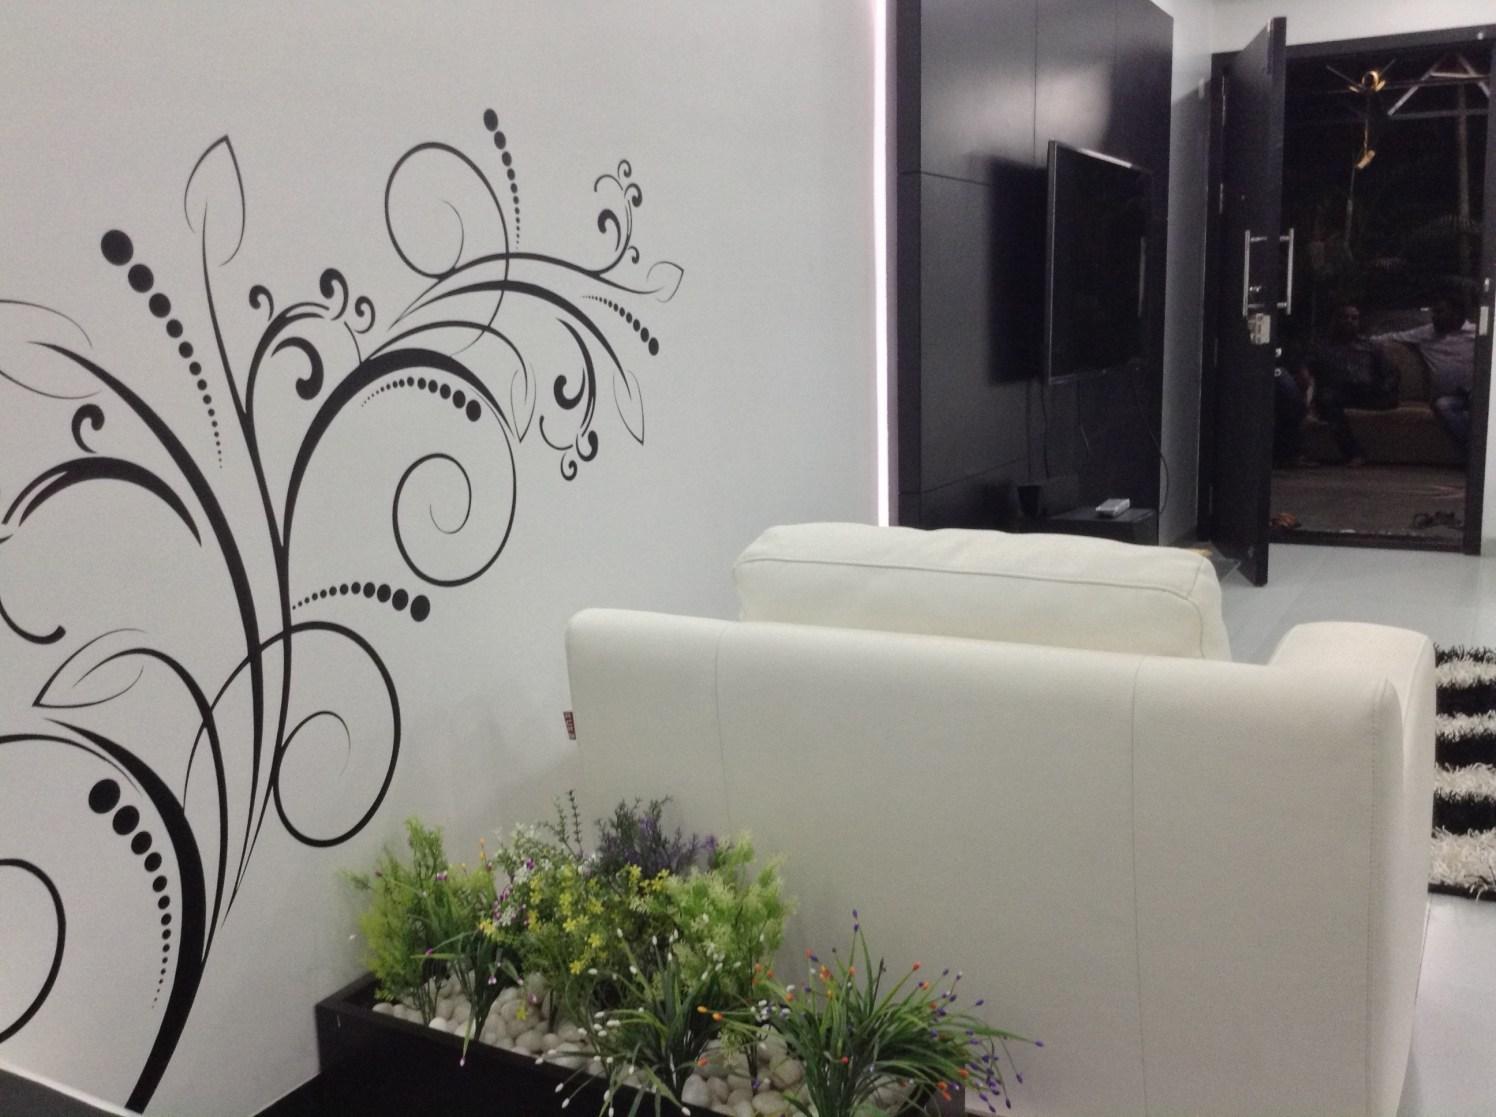 The Nature Element by Siddhant Ashtekar Living-room Contemporary | Interior Design Photos & Ideas